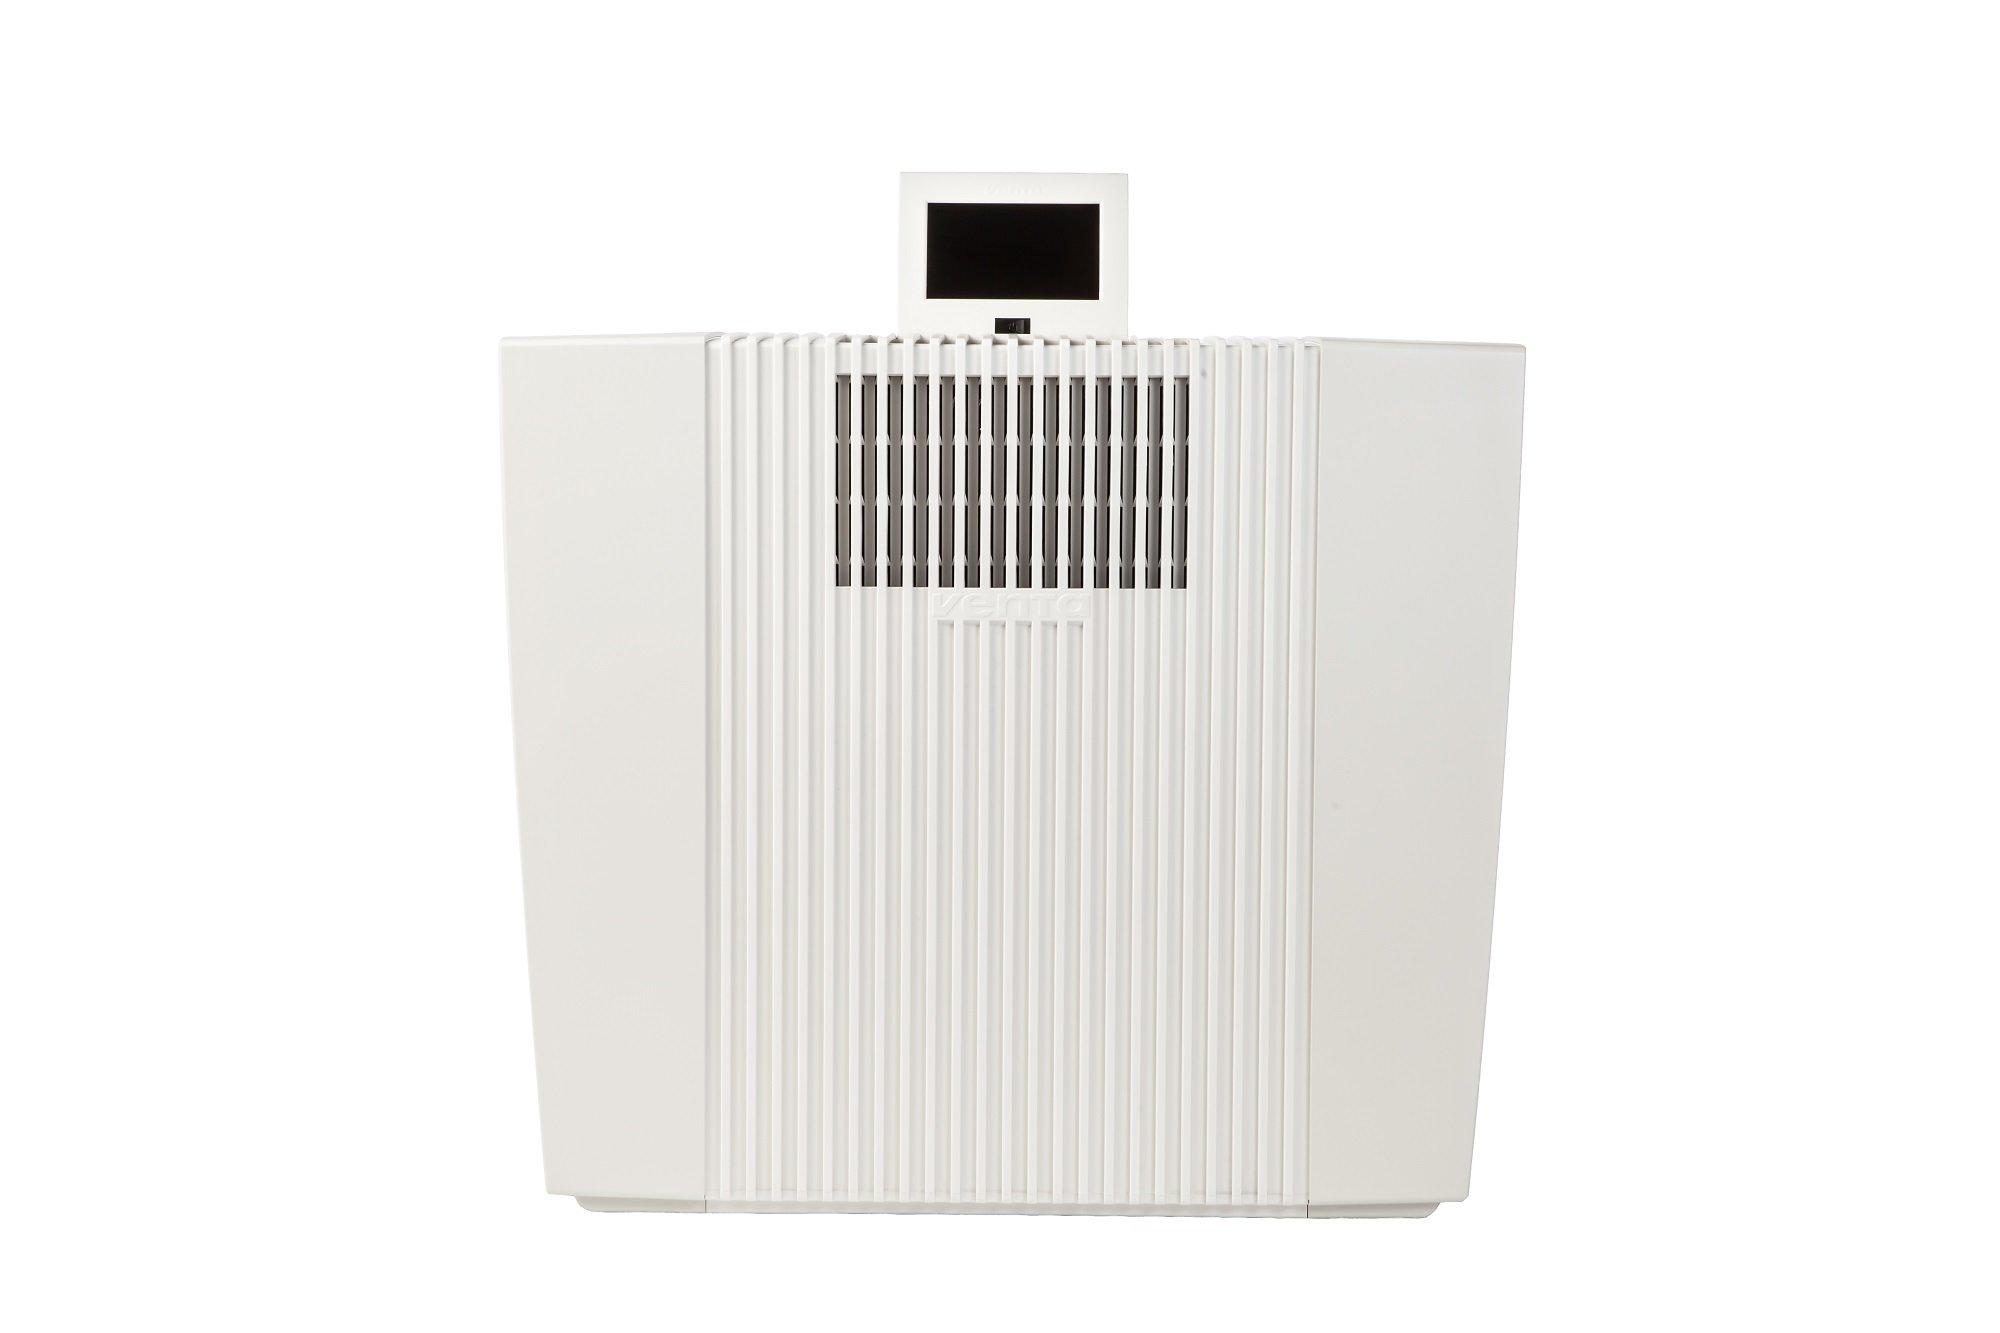 Venta Kuube XL-T Airwasher Humidifier in White